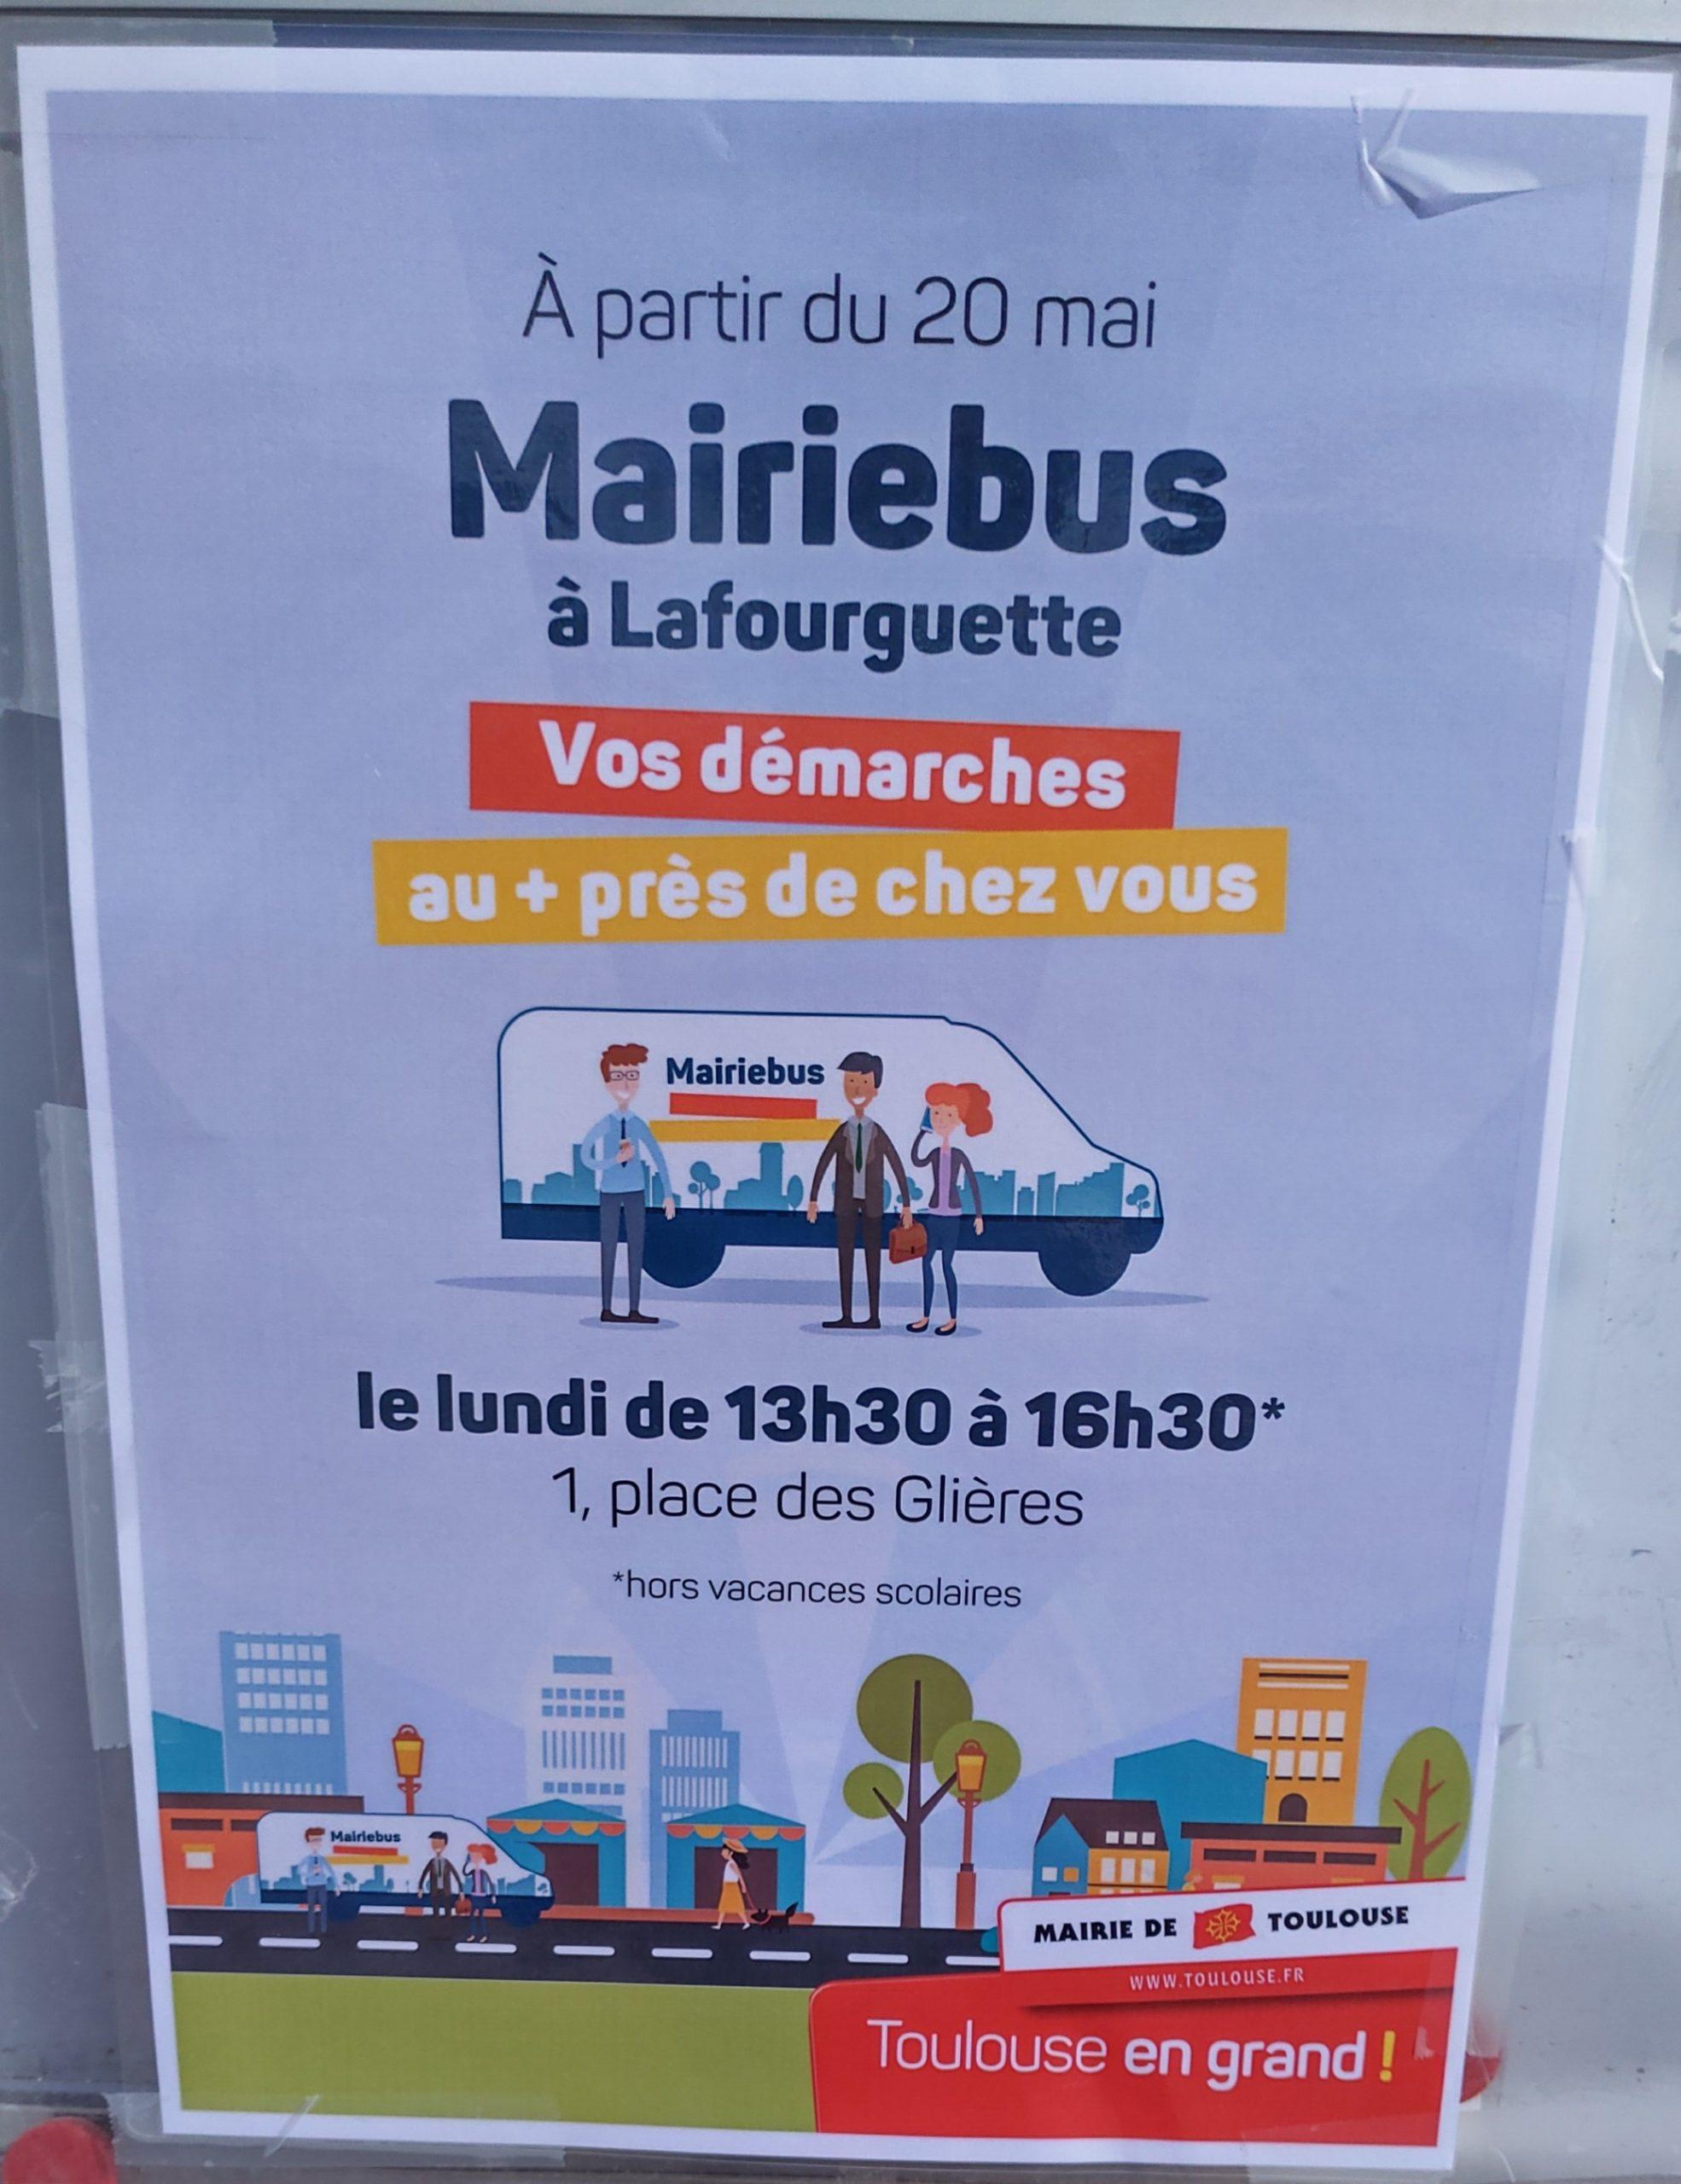 MairieBus - le lundi de 13h30 à 16h30